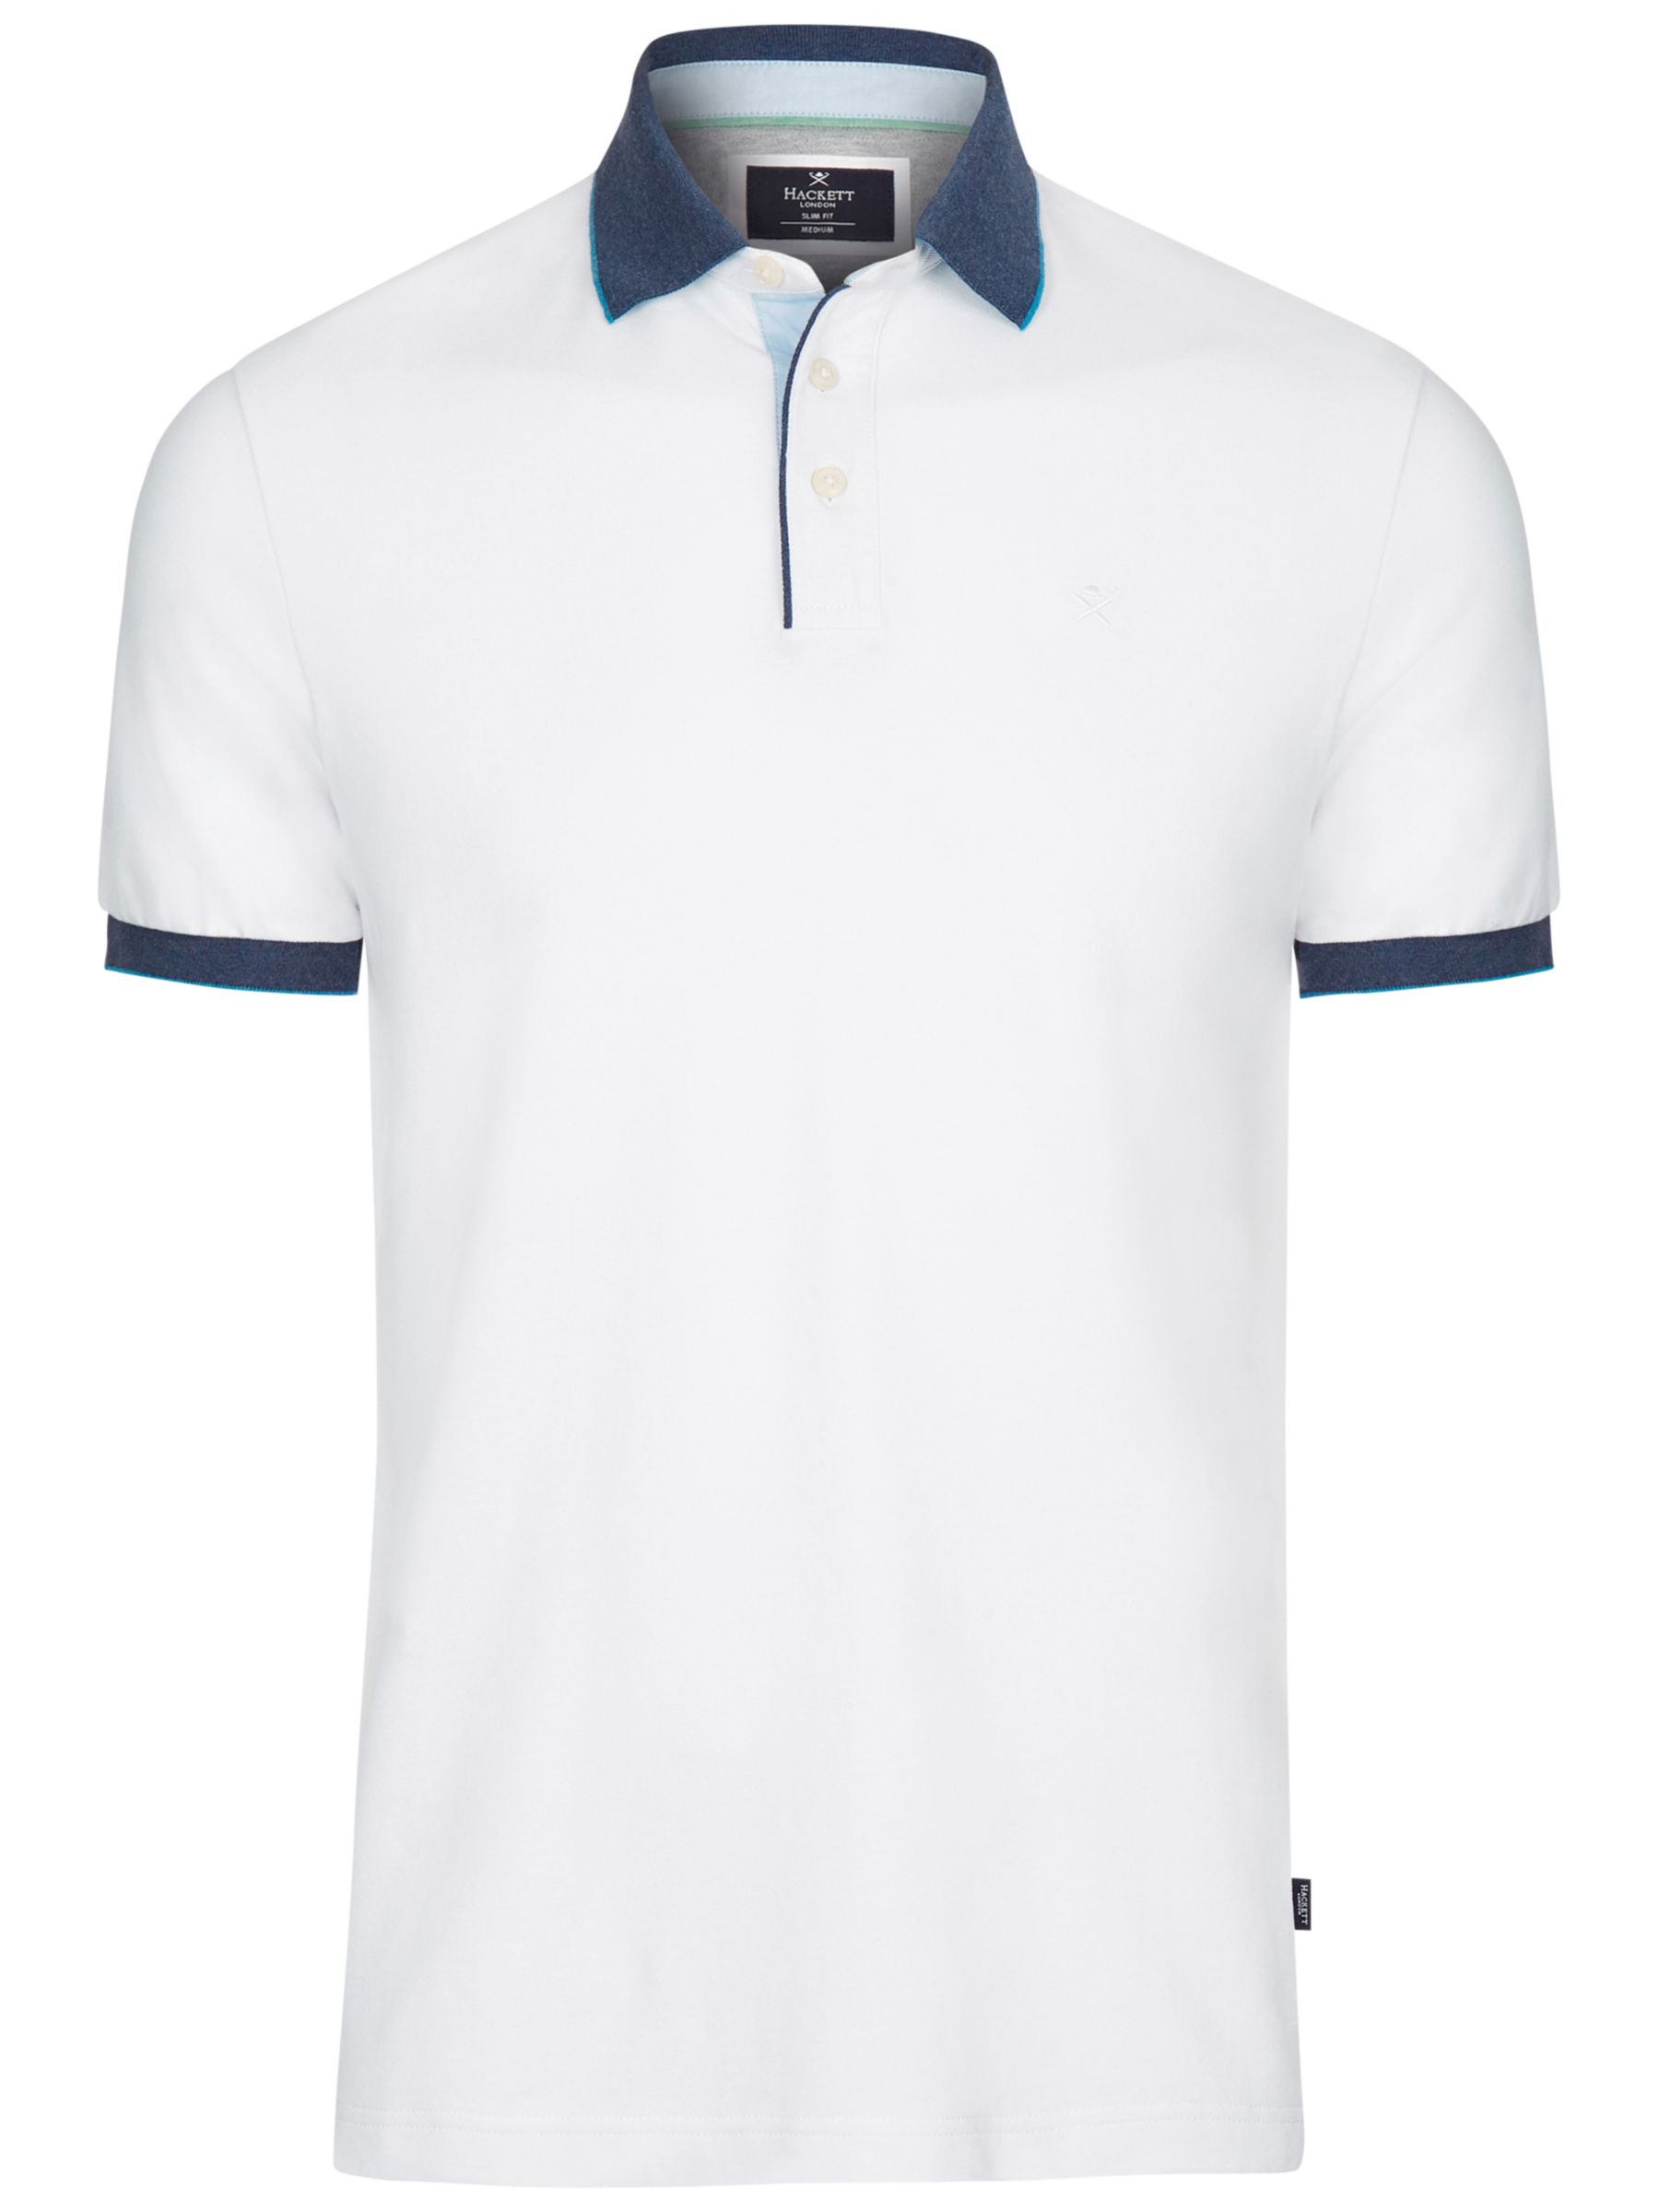 Hackett London Hackett London Woven Trim Polo Shirt, White